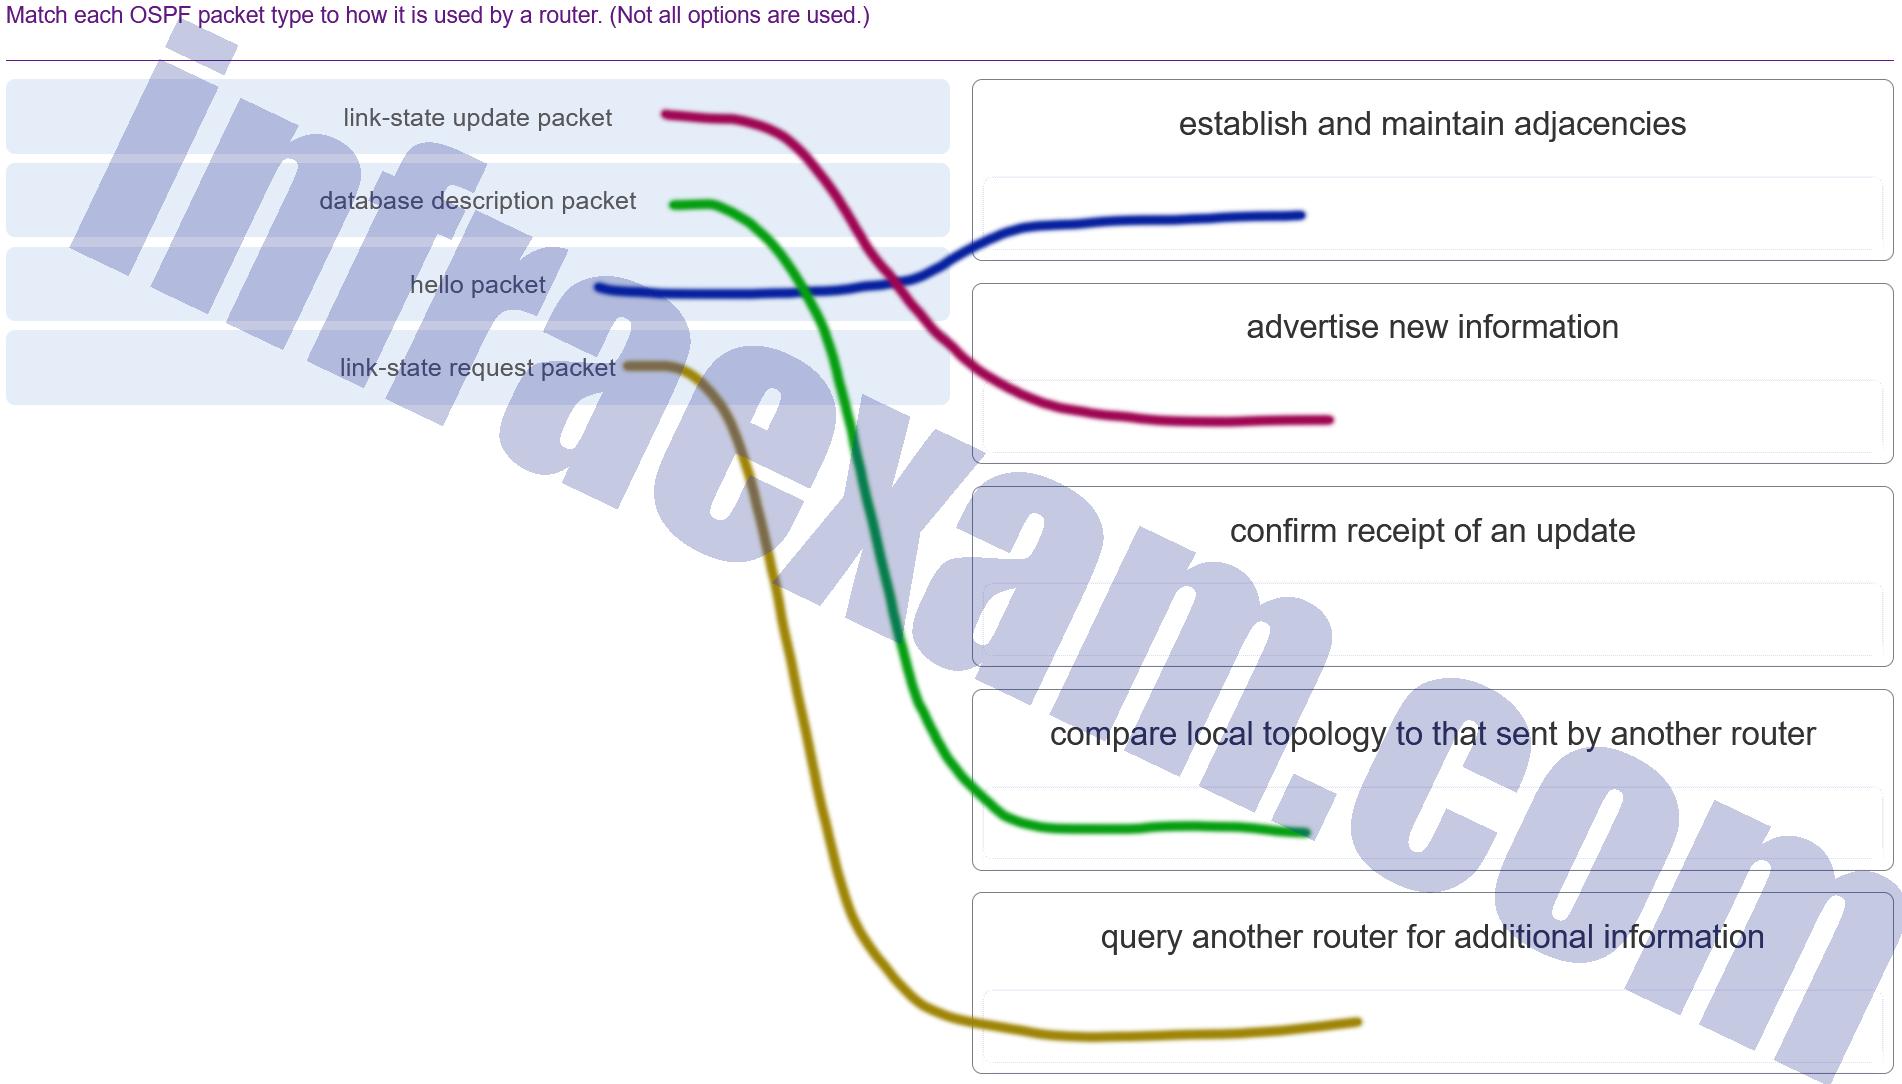 CCNA3 v7 – ENSA – Modules 1 – 2 OSPF Concepts and Configuration Exam Answers 0០1